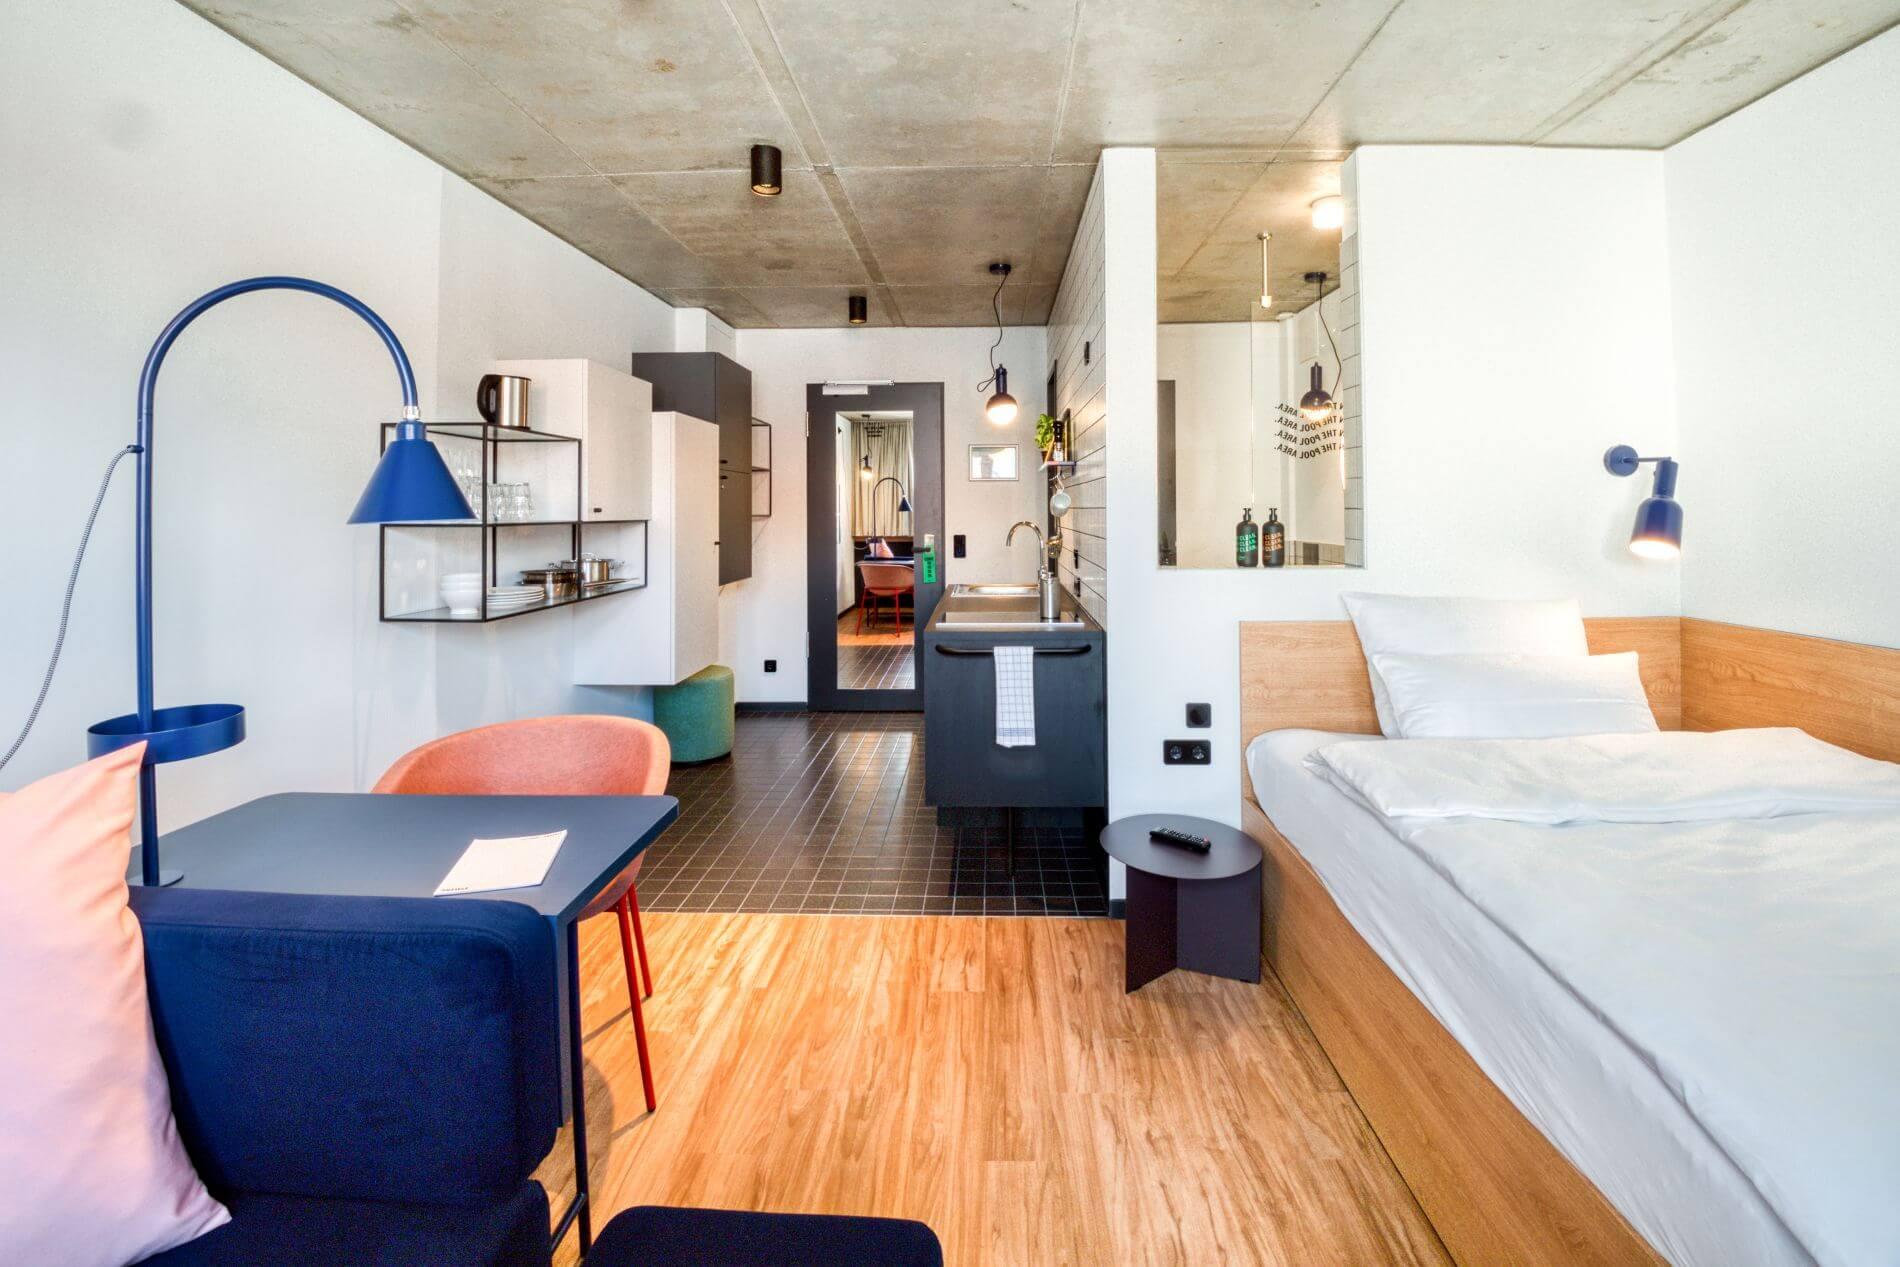 Studio serviced apartment in Friedrichshain, Berlin for long term stays